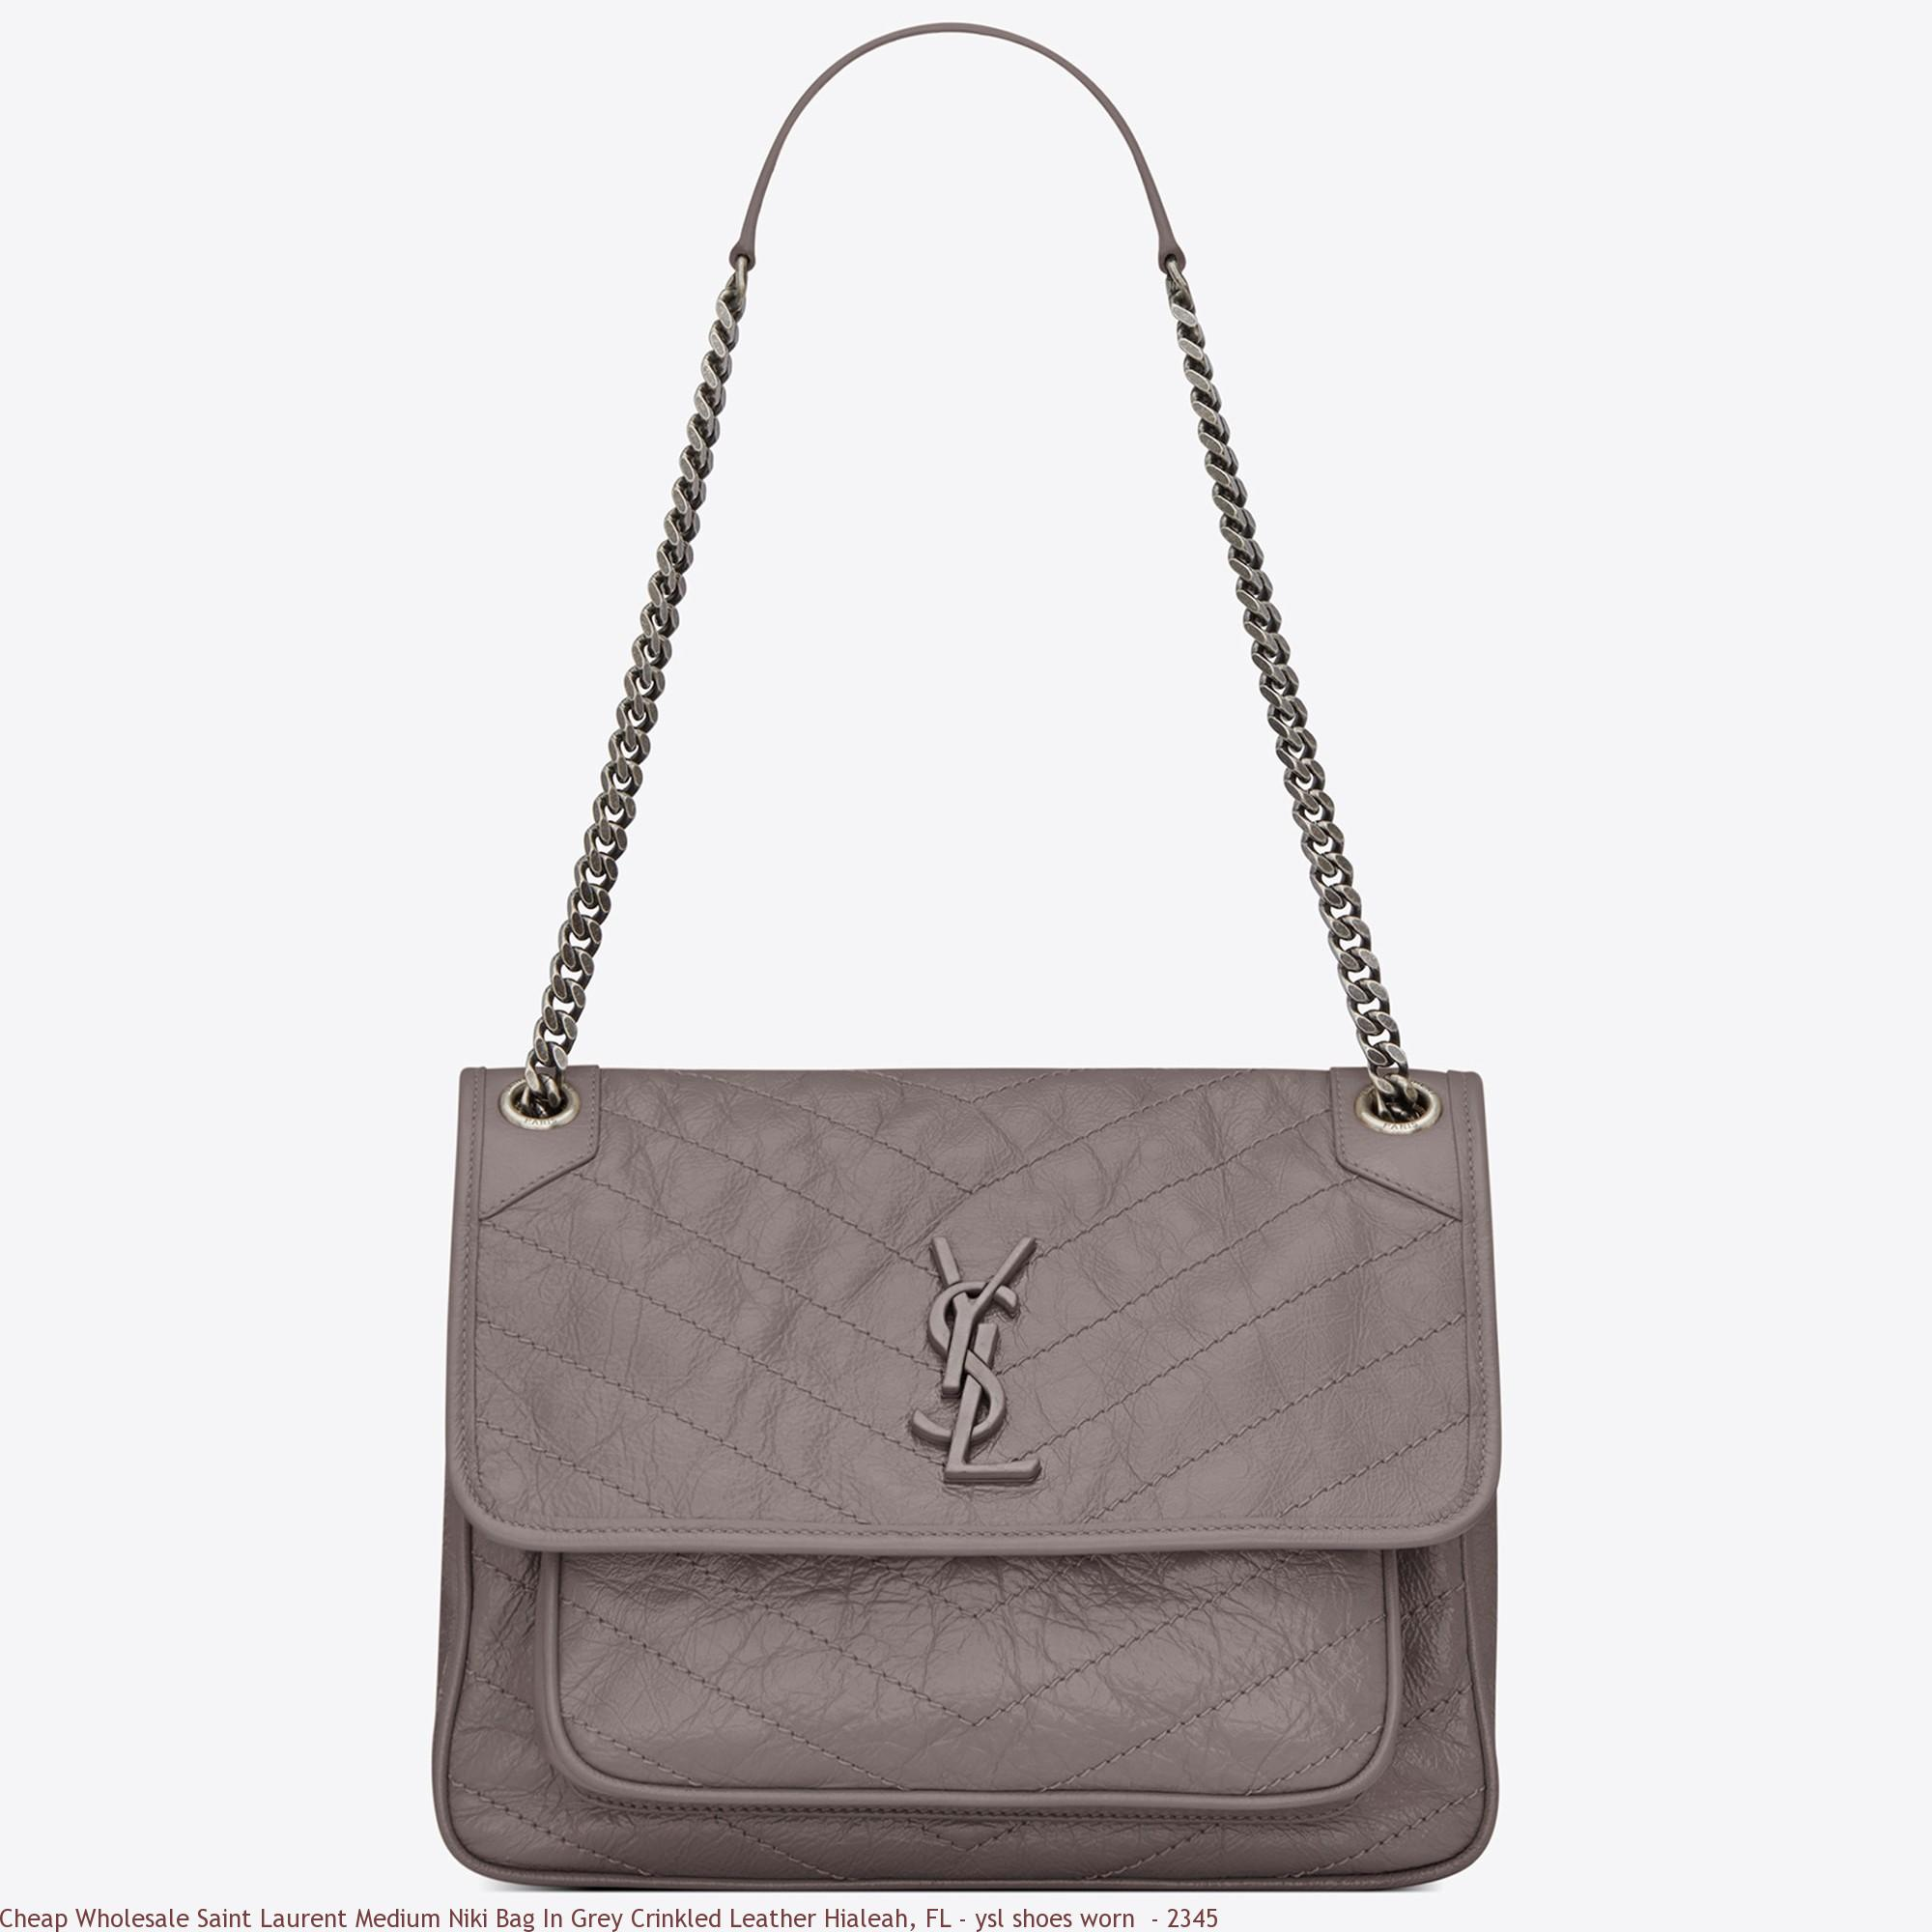 Cheap Wholesale Saint Laurent Medium Niki Bag In Grey